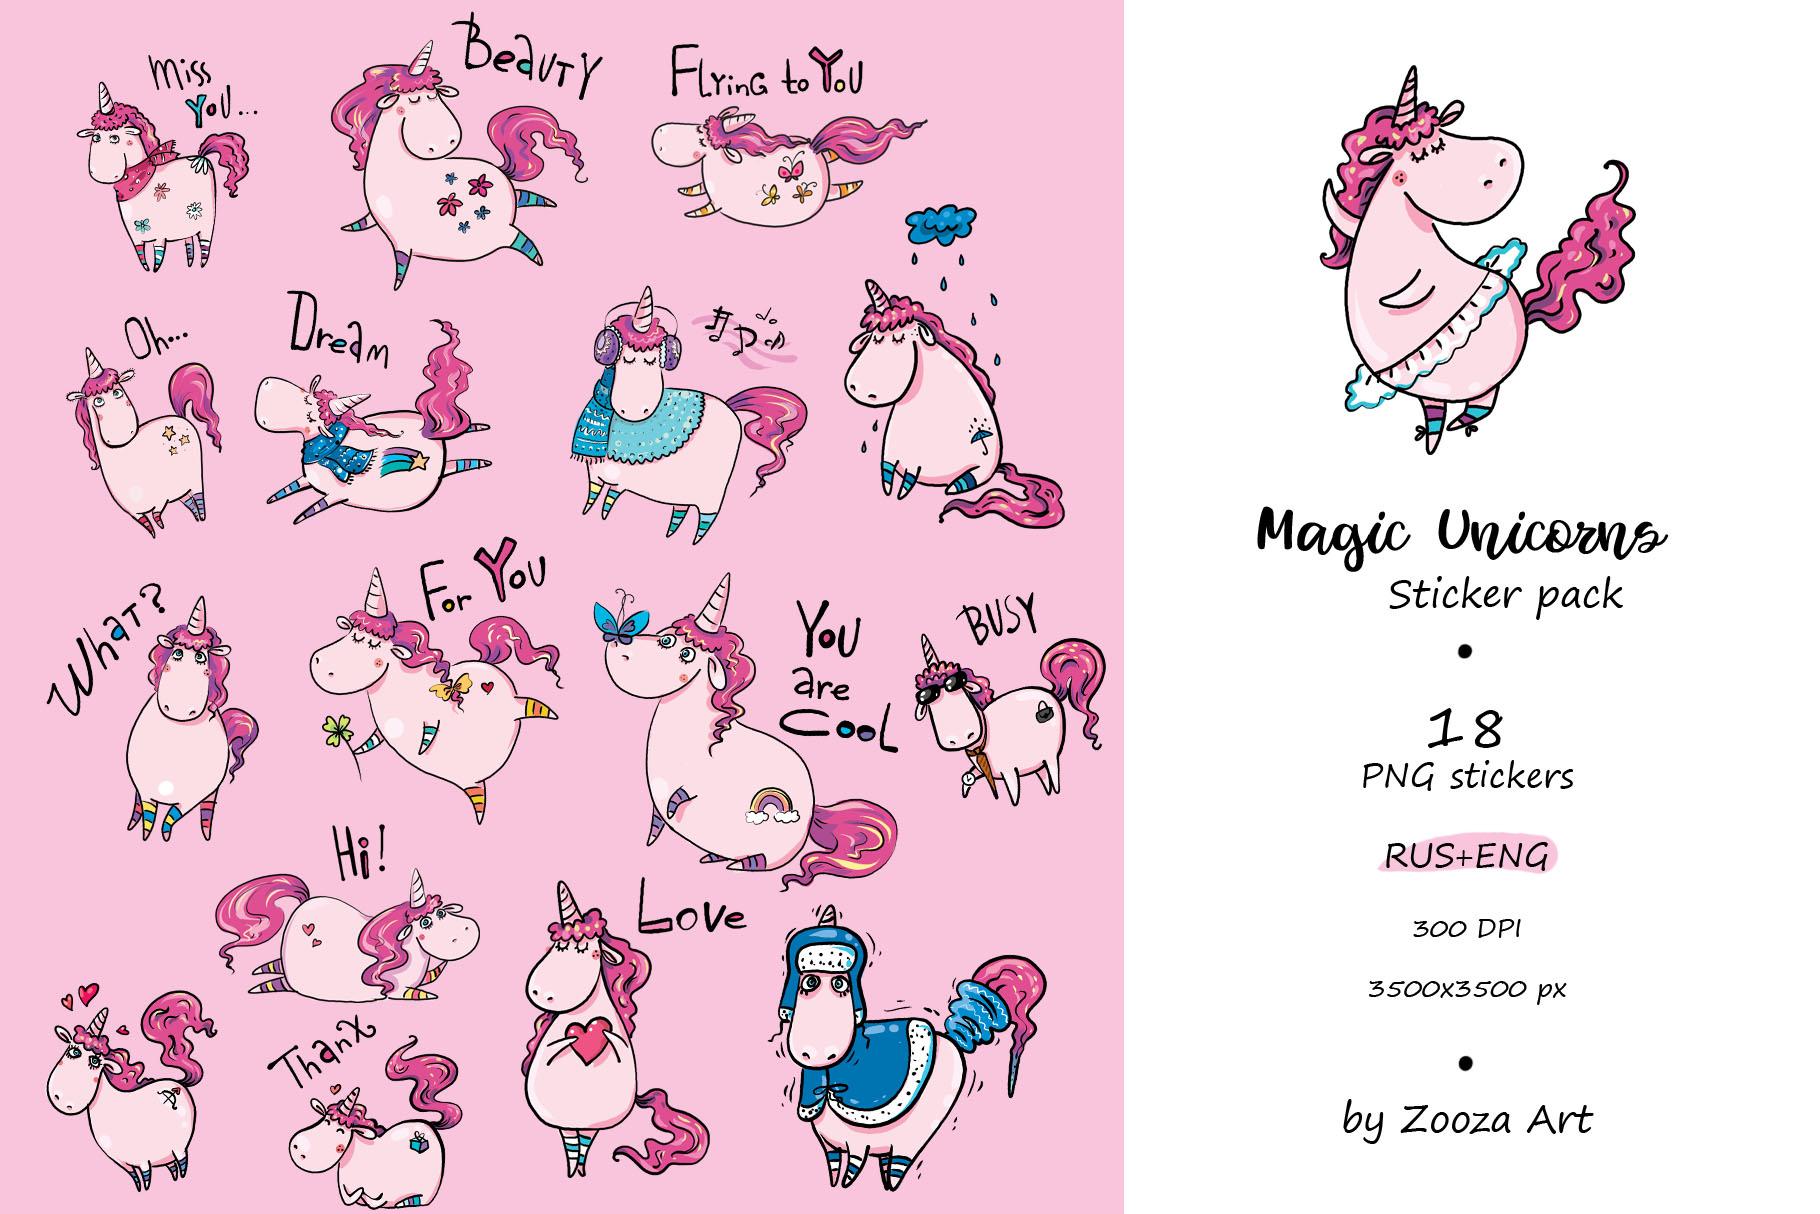 Magic Unicorns 18 stickers Rus-Eng example image 2